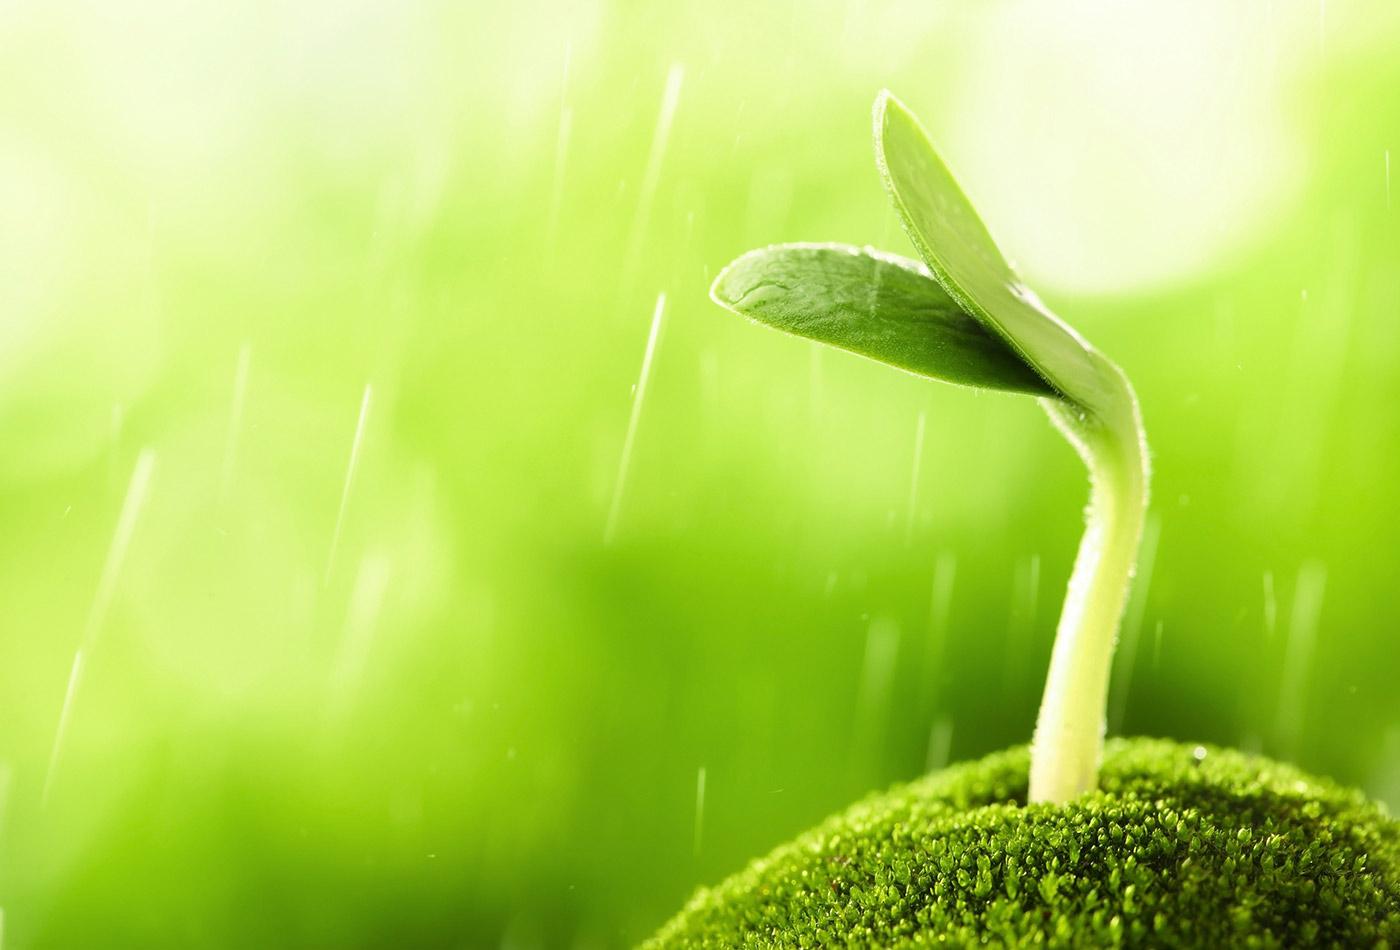 Sprouting seedling.